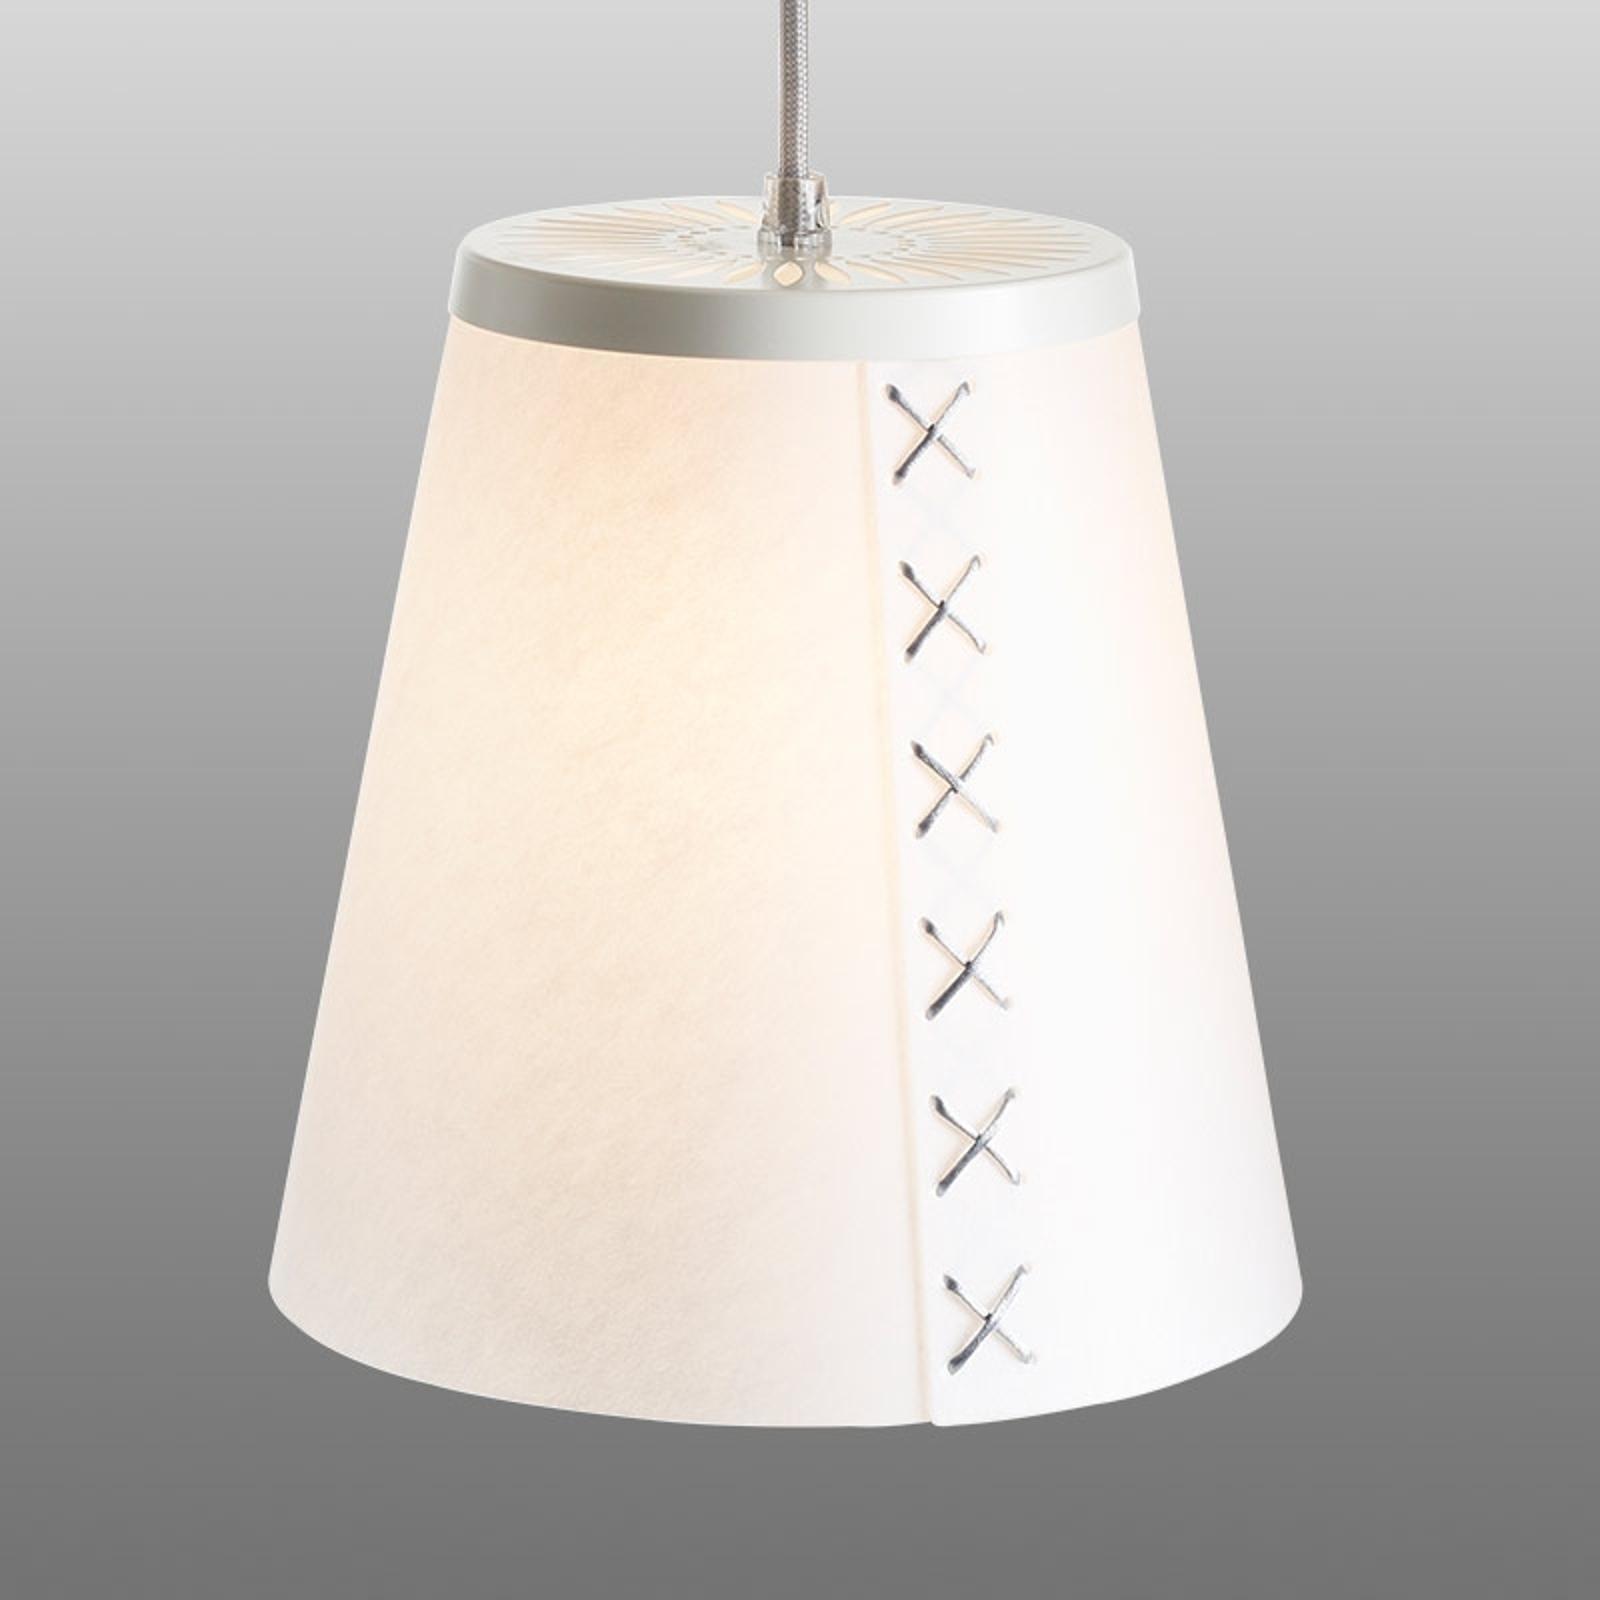 FLÖR - lampa wisząca z Lunopalu, srebrny kabel